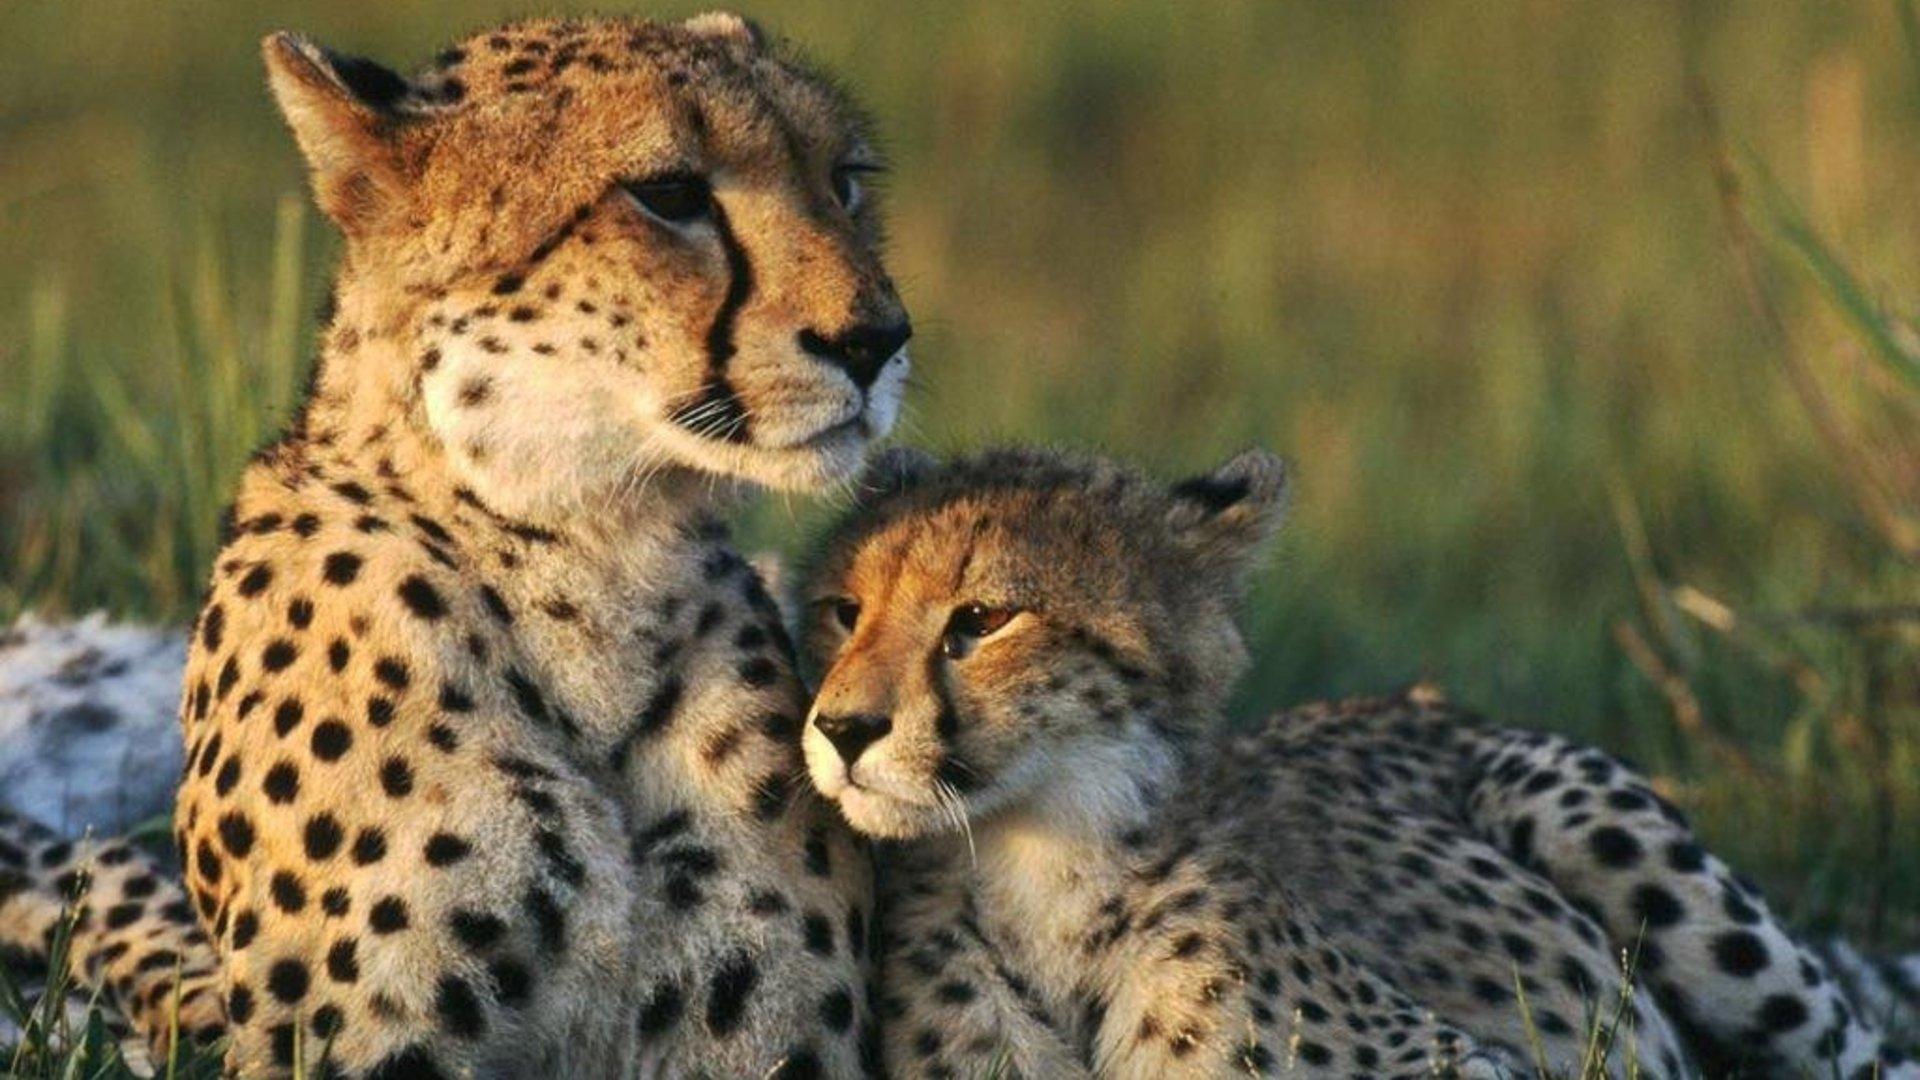 Res: 1920x1080, Cheetah Wallpapers 7 - 1920 X 1080